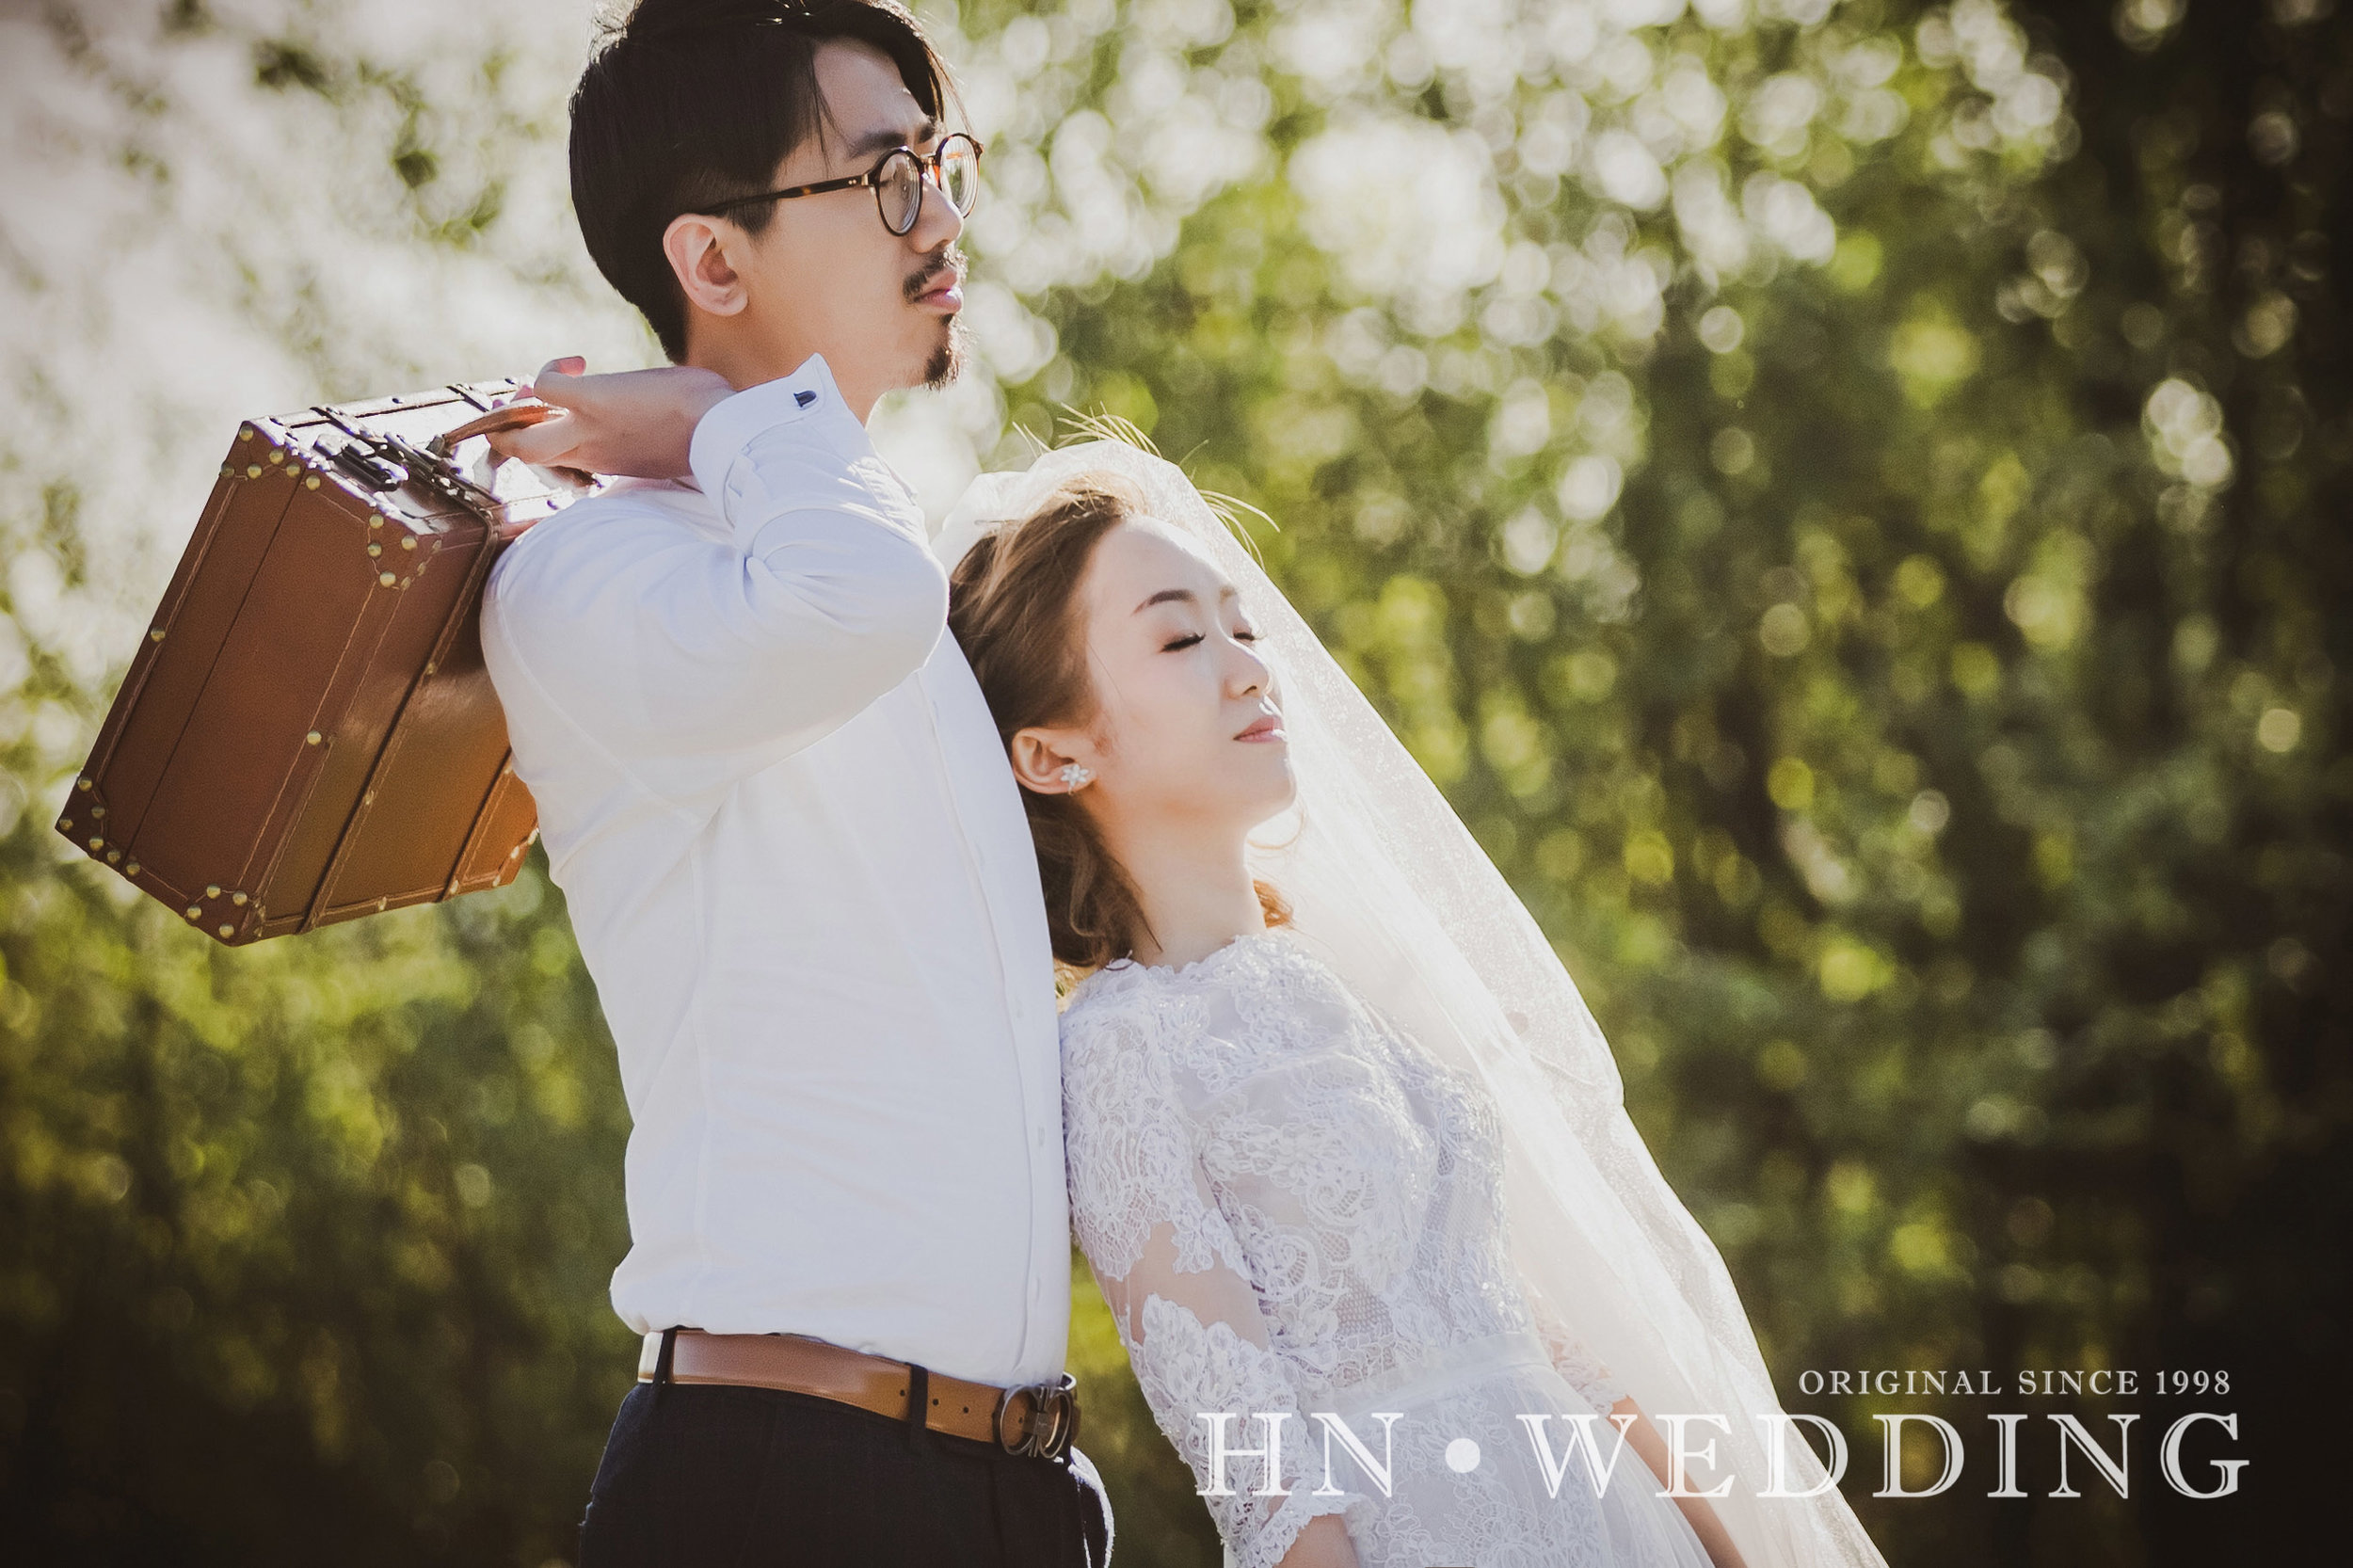 hnweddingweddingdayA&R-39.jpg